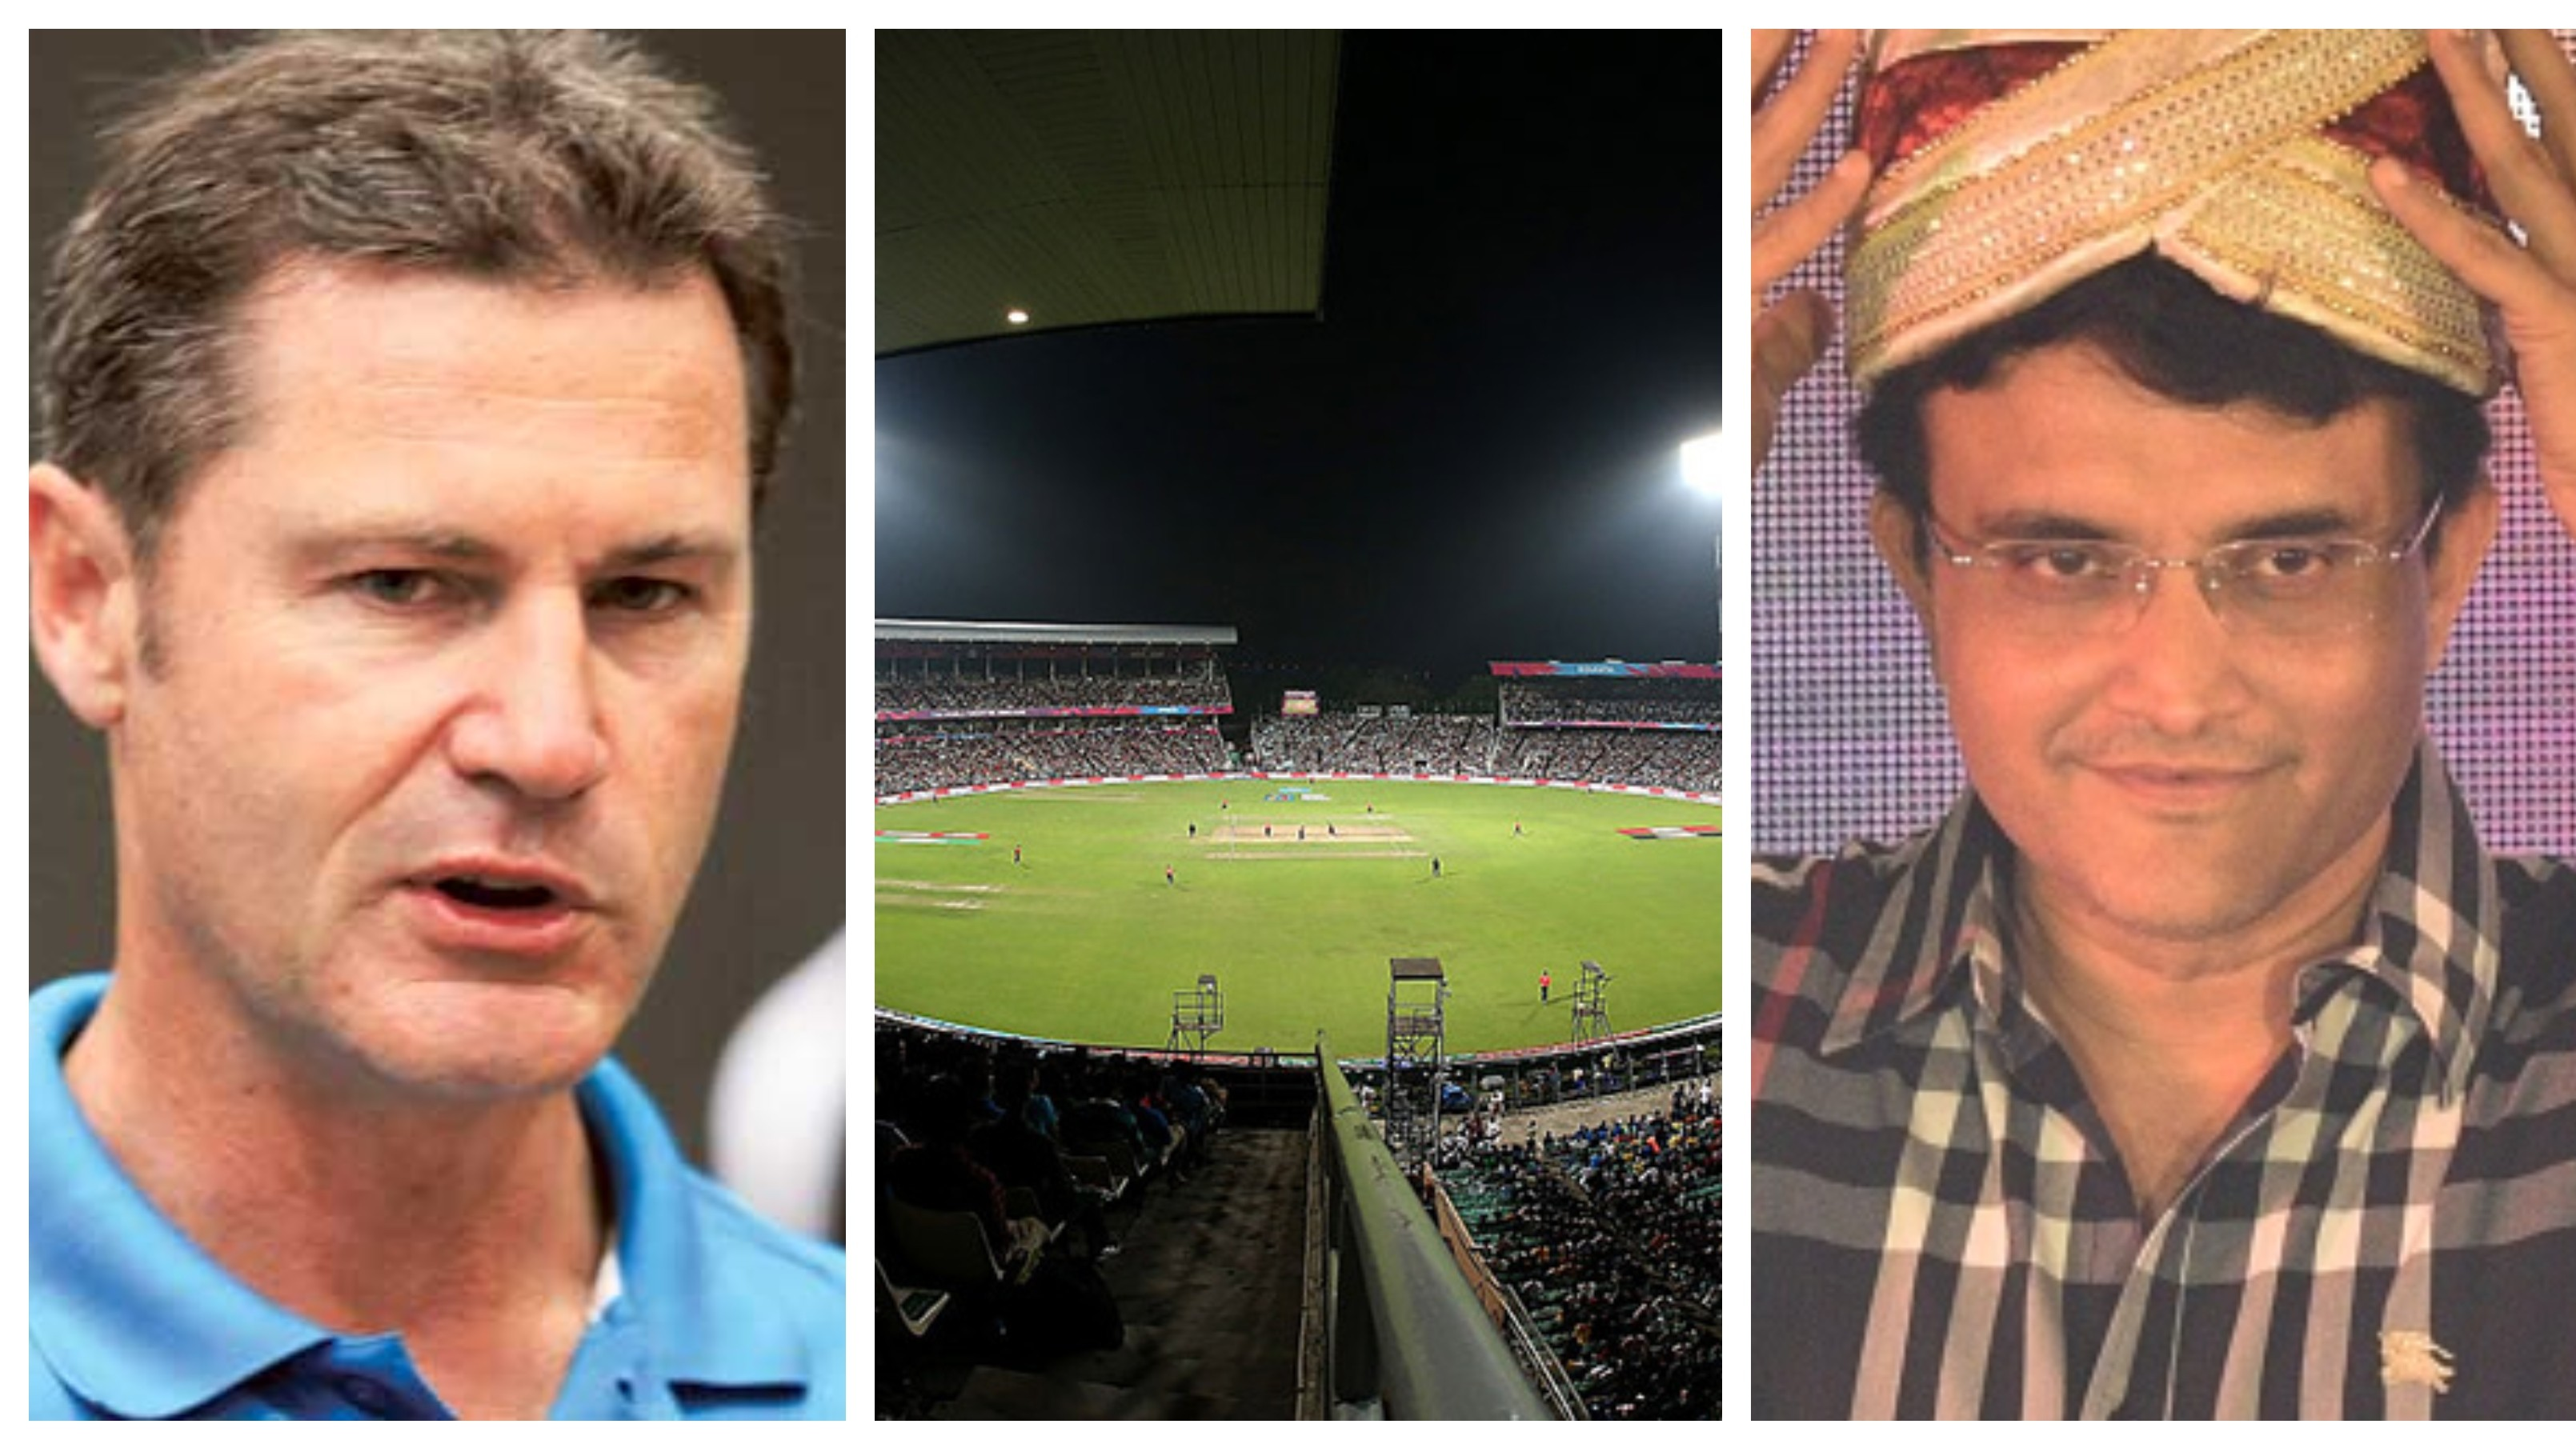 IND v BAN 2019: Simon Taufel backs Sourav Ganguly over call to organise D/N Test in Kolkata